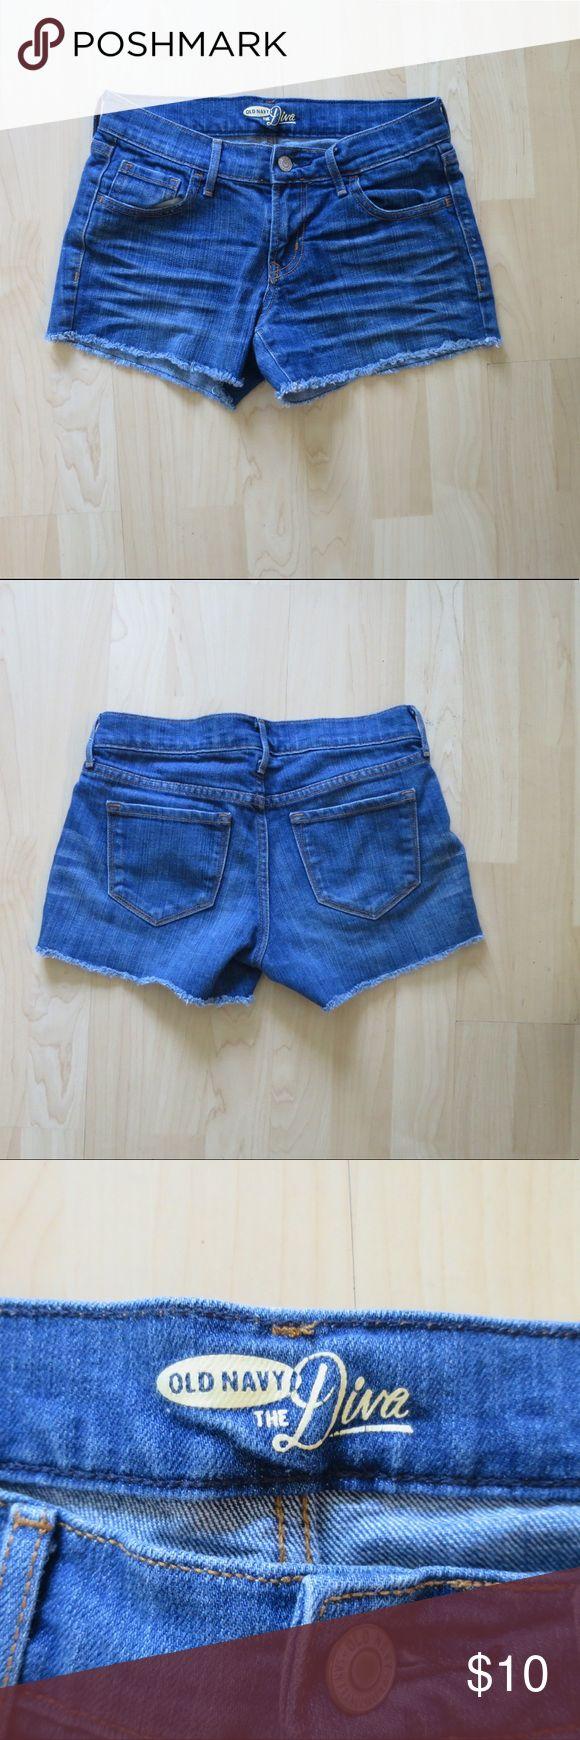 Old navy jean shorts Old navy jean shorts. In good condition. Old Navy Shorts Jean Shorts